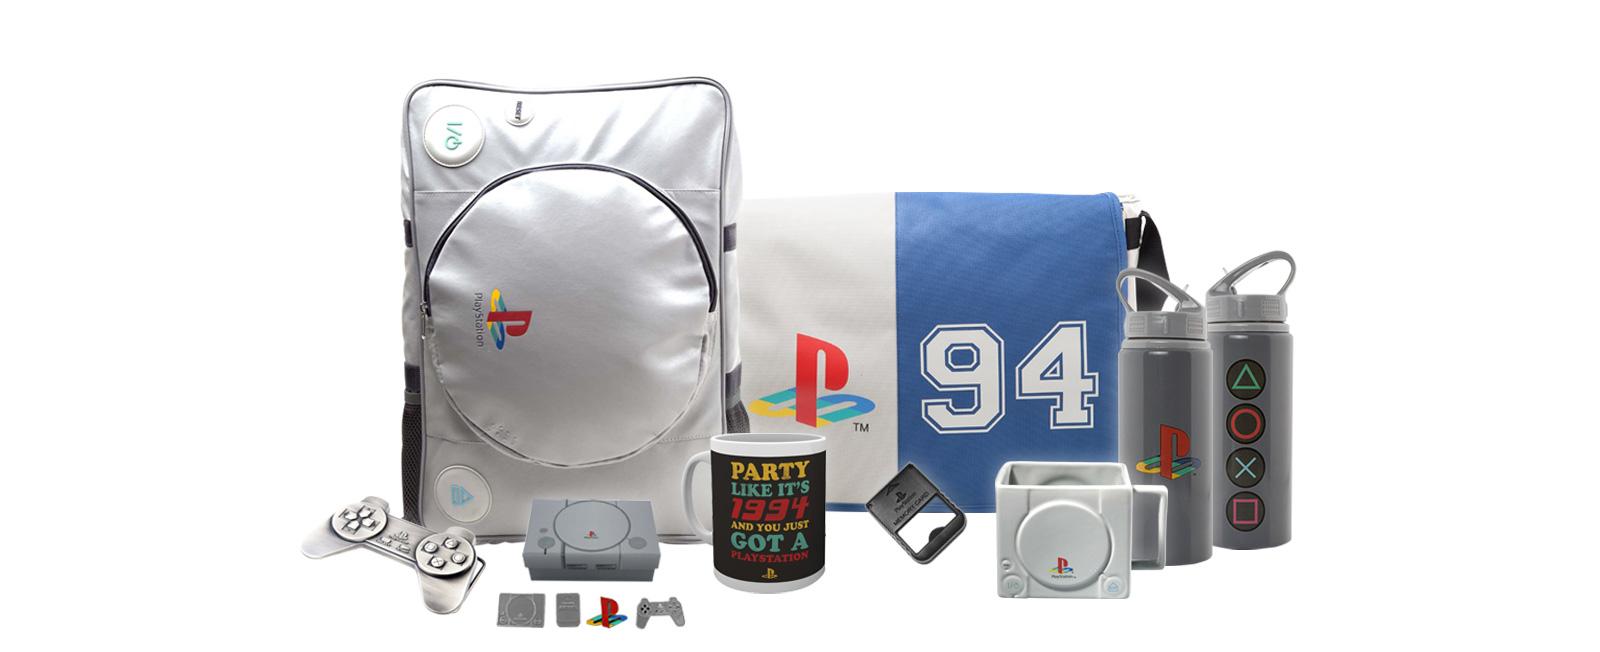 PlayStation Gear merchandise